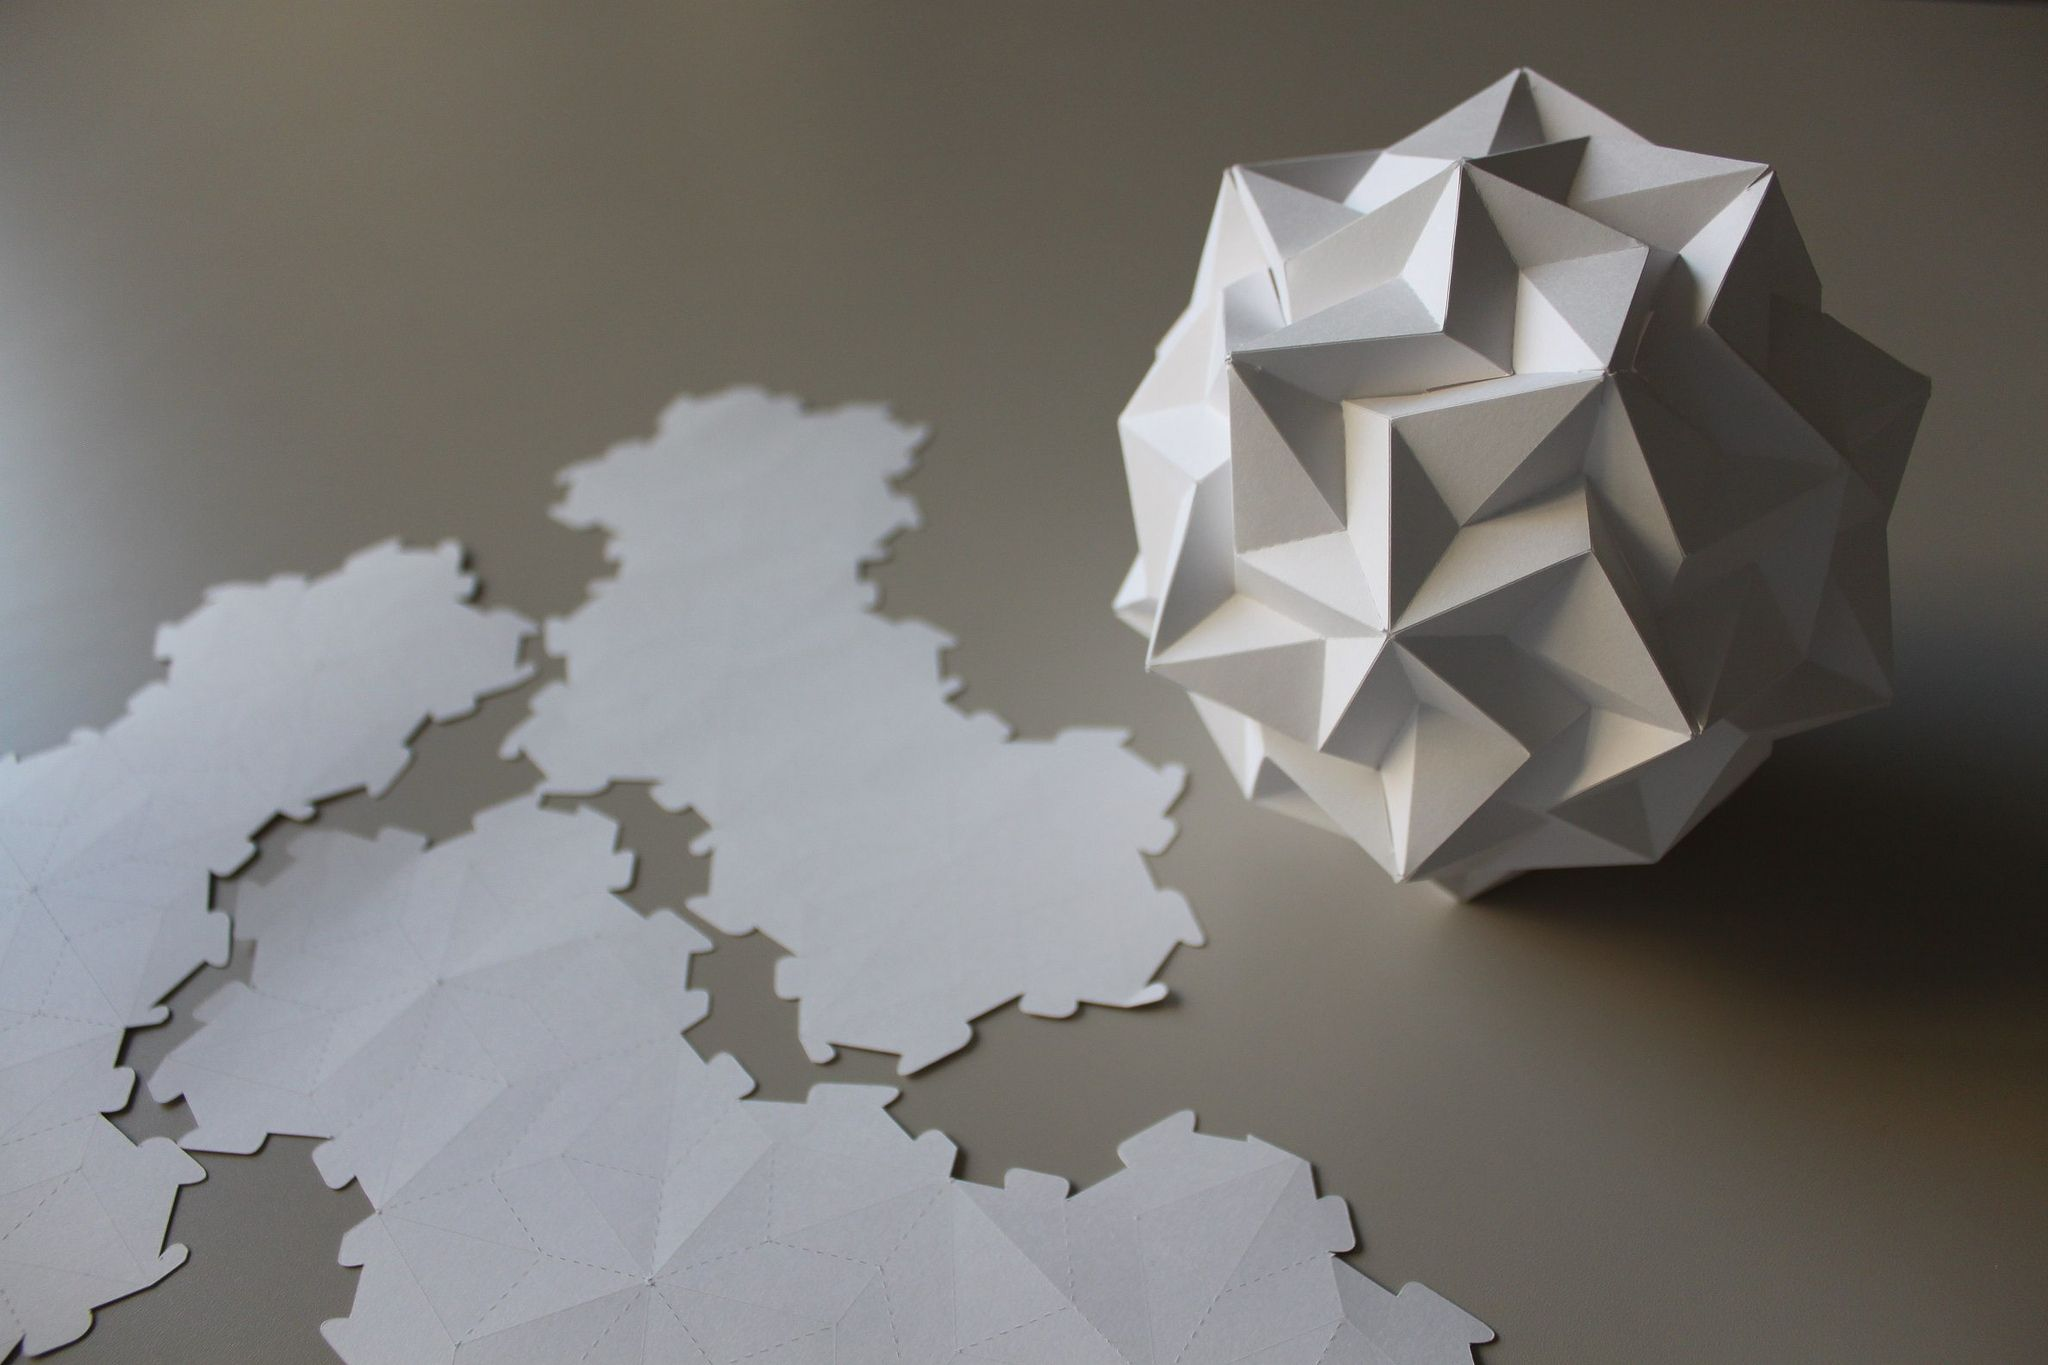 Dodecahedron Paradigma | Origami, Paper folding and Kirigami - photo#31